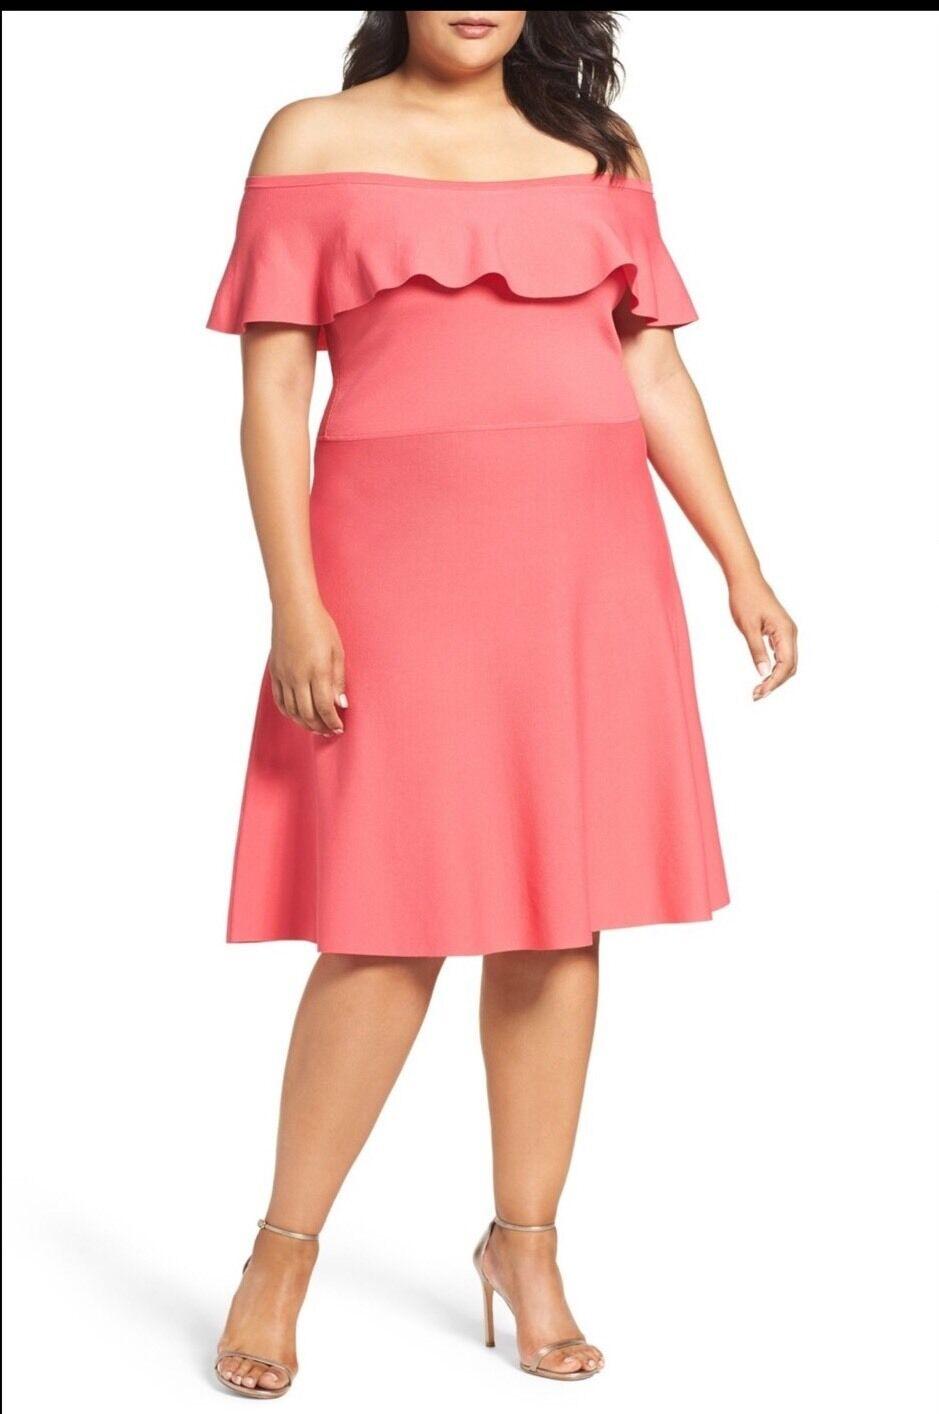 NWT Eliza J Off the Shoulder Dress Plus Size 2X Coral